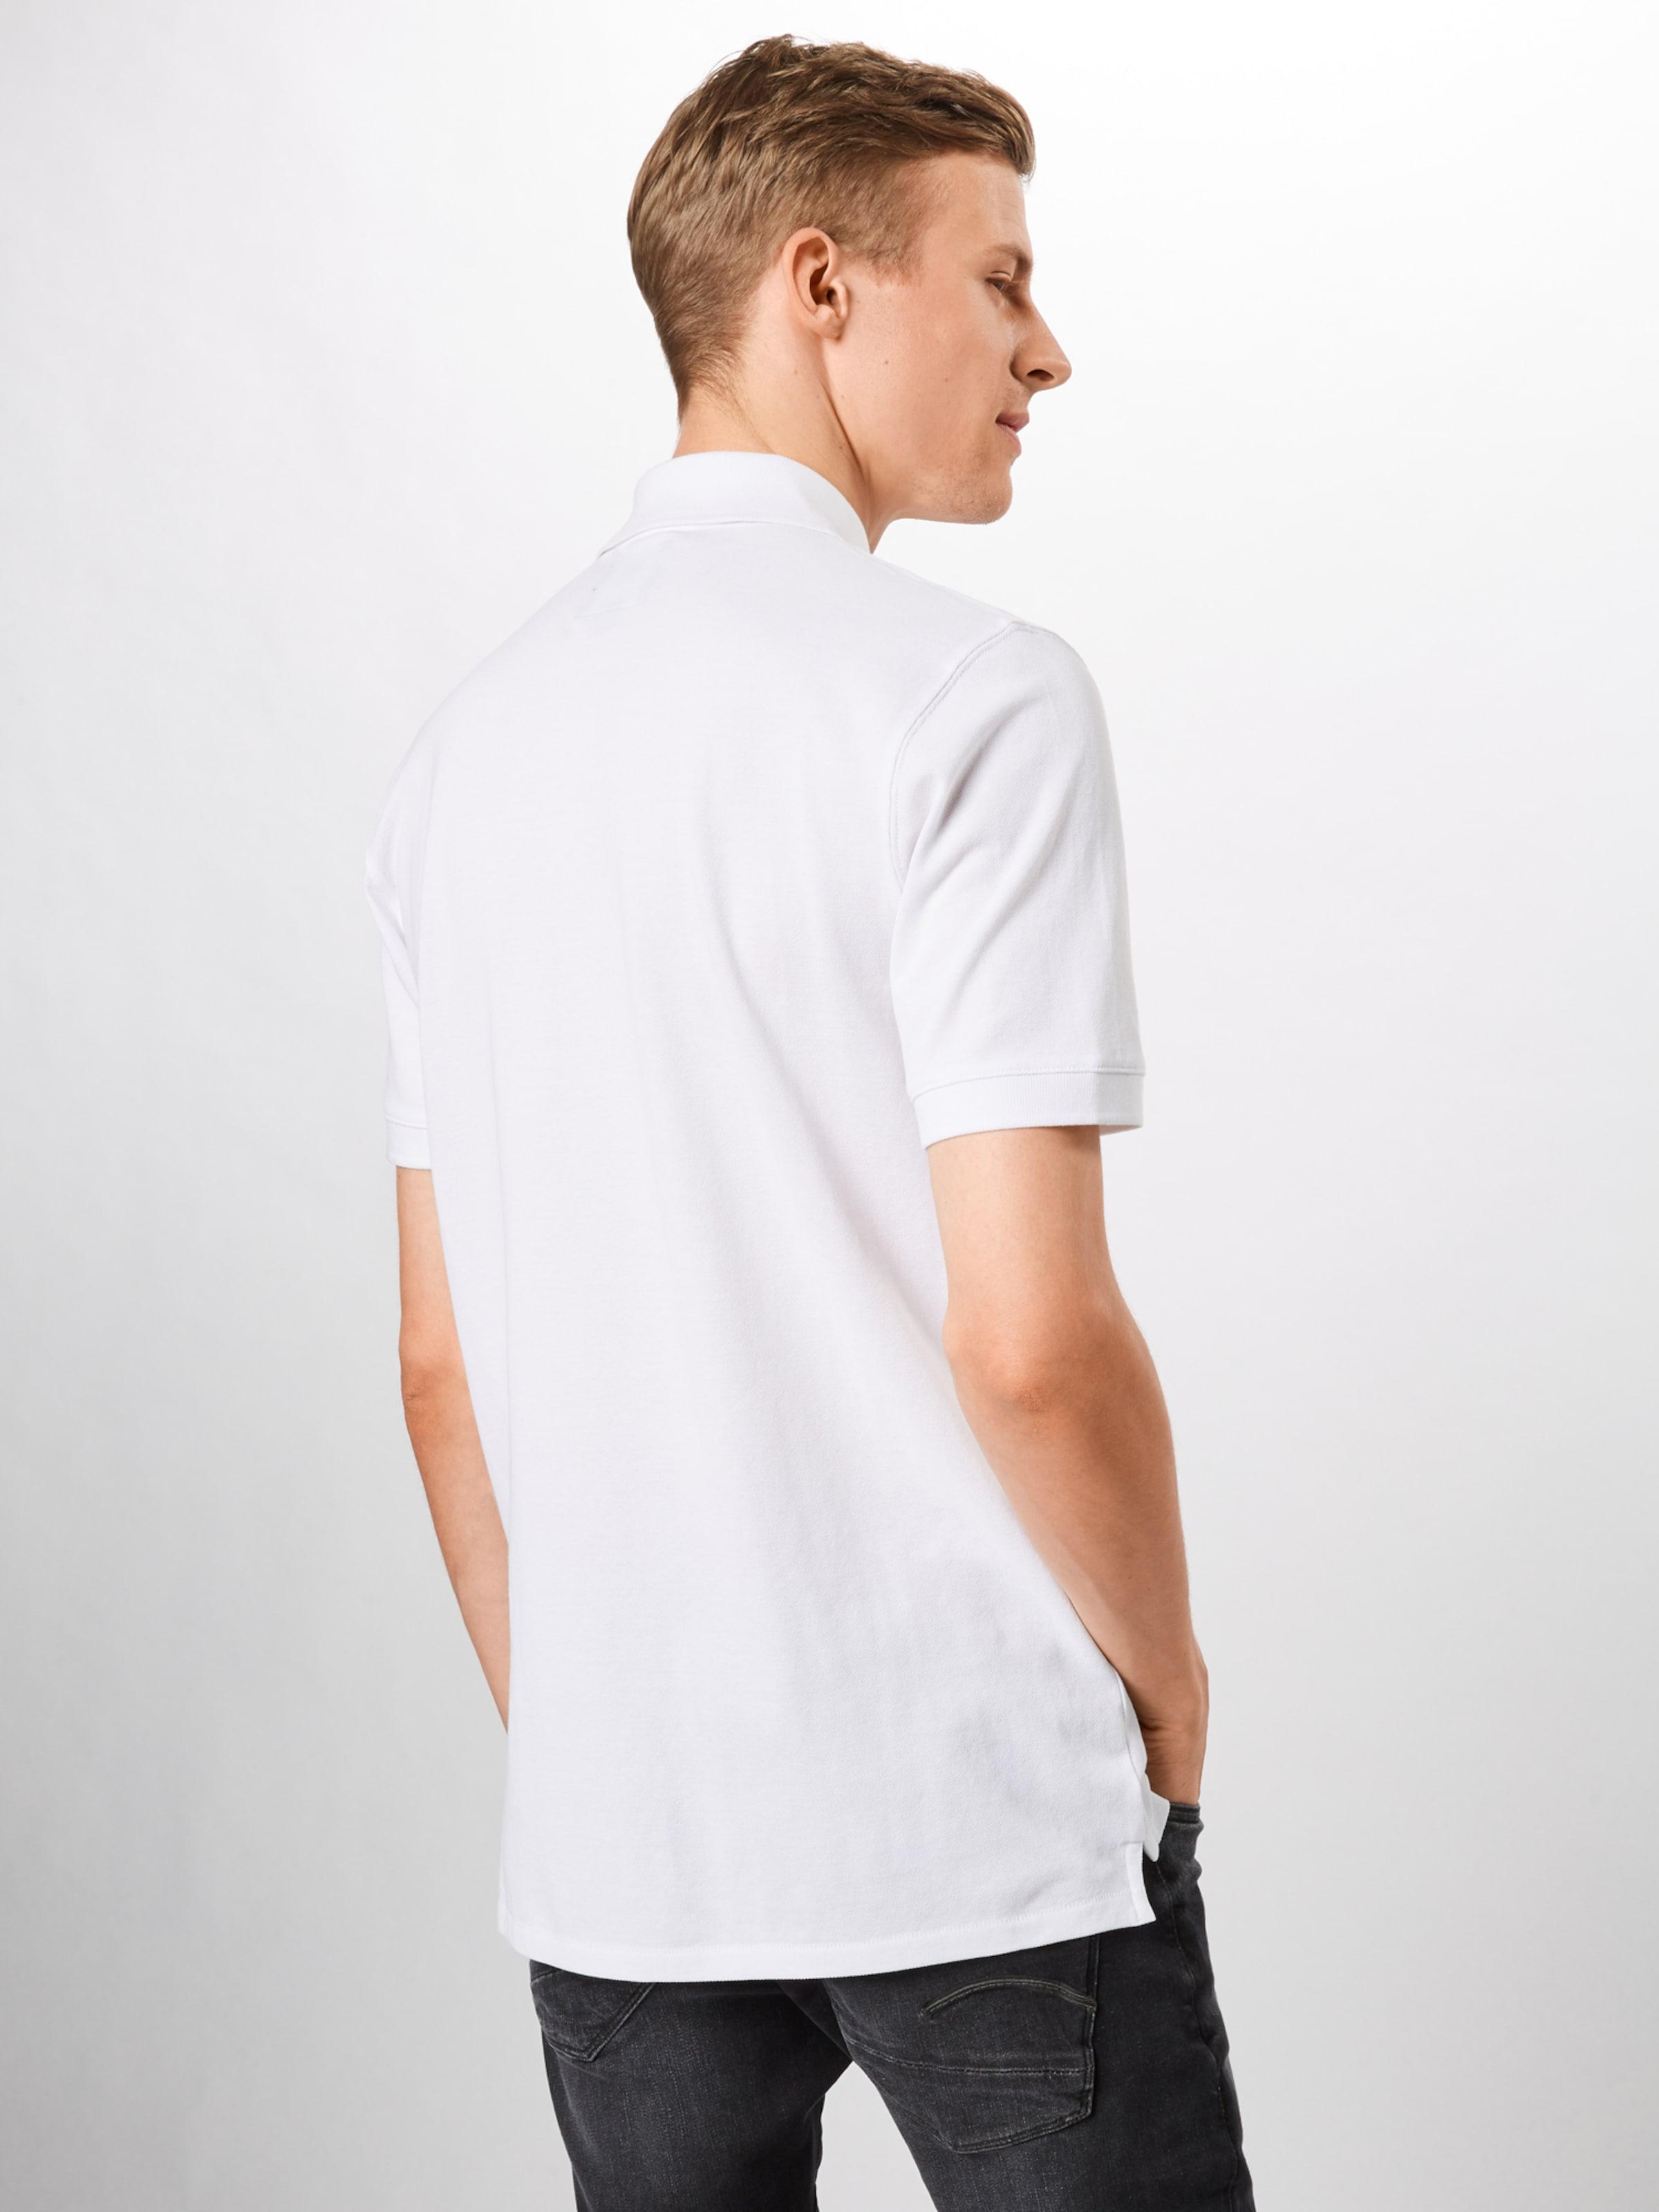 star T Raw shirt 'graphic' Kaki G En 8mOy0vNwn